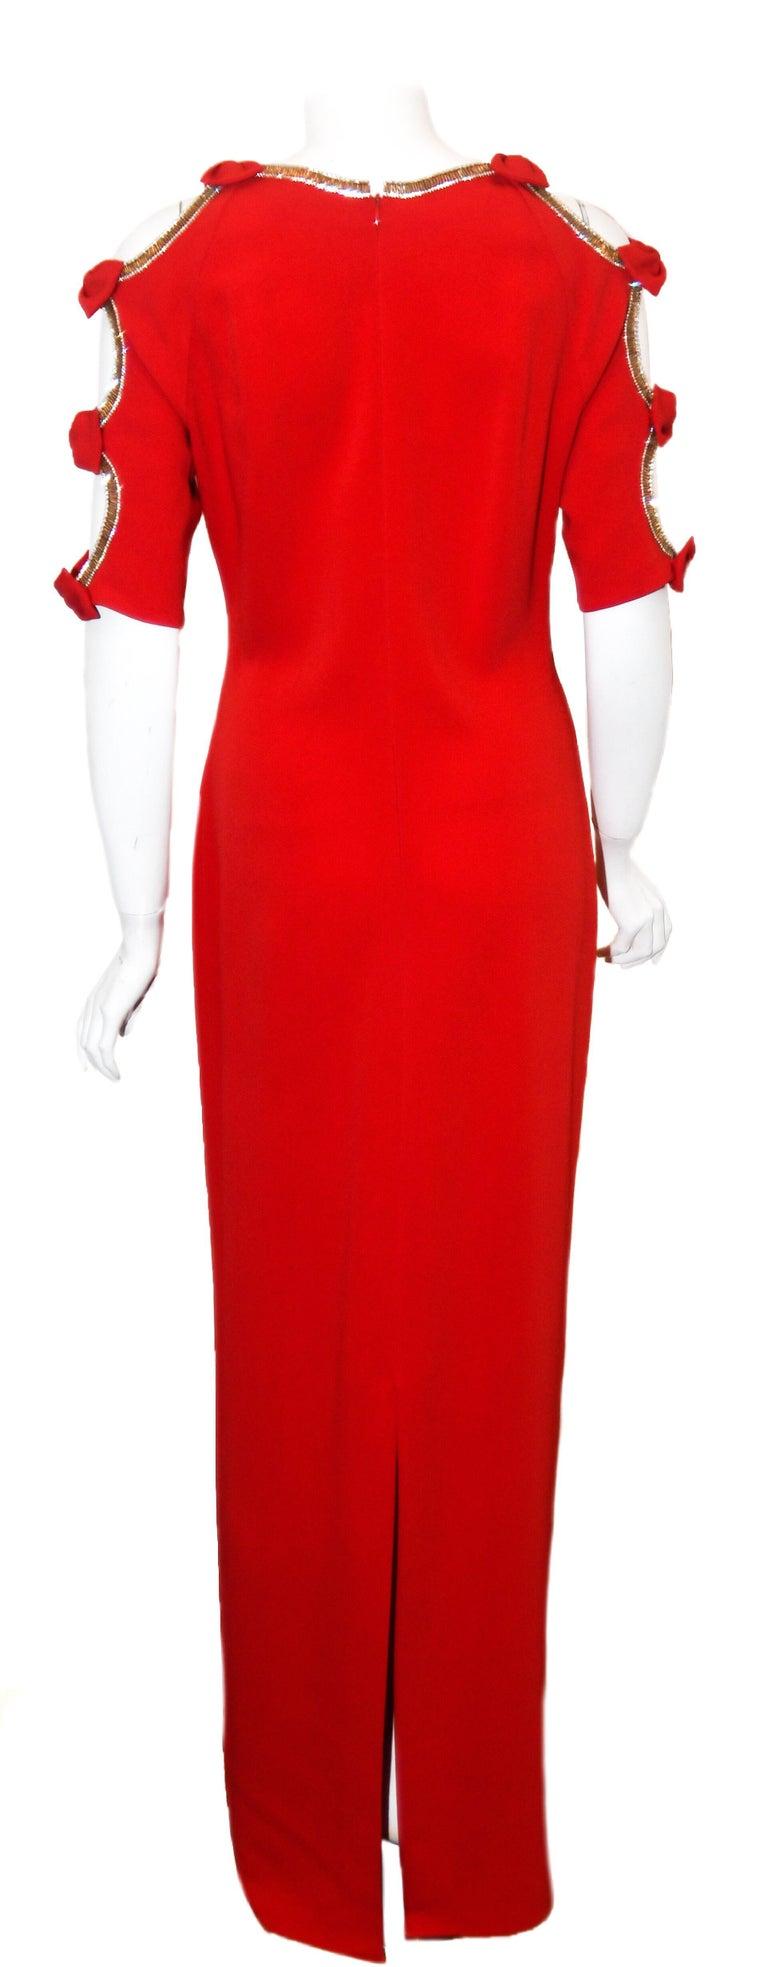 Women's Jenny Packham Red Gown W/ Cold Shoulder Embellished Sleeves For Sale